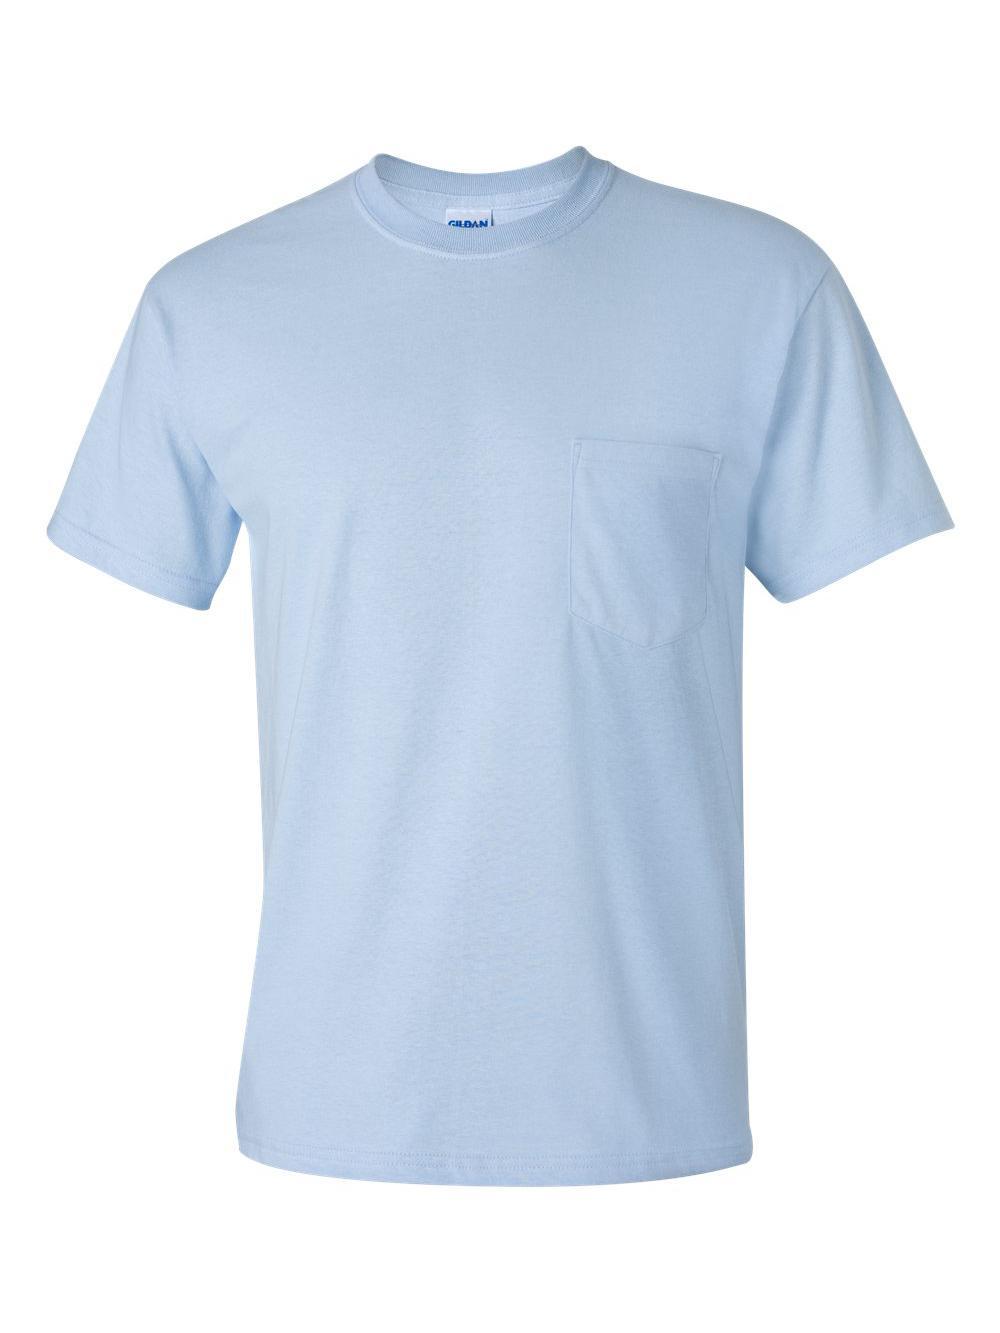 Gildan-Ultra-Cotton-T-Shirt-with-a-Pocket-2300 thumbnail 15